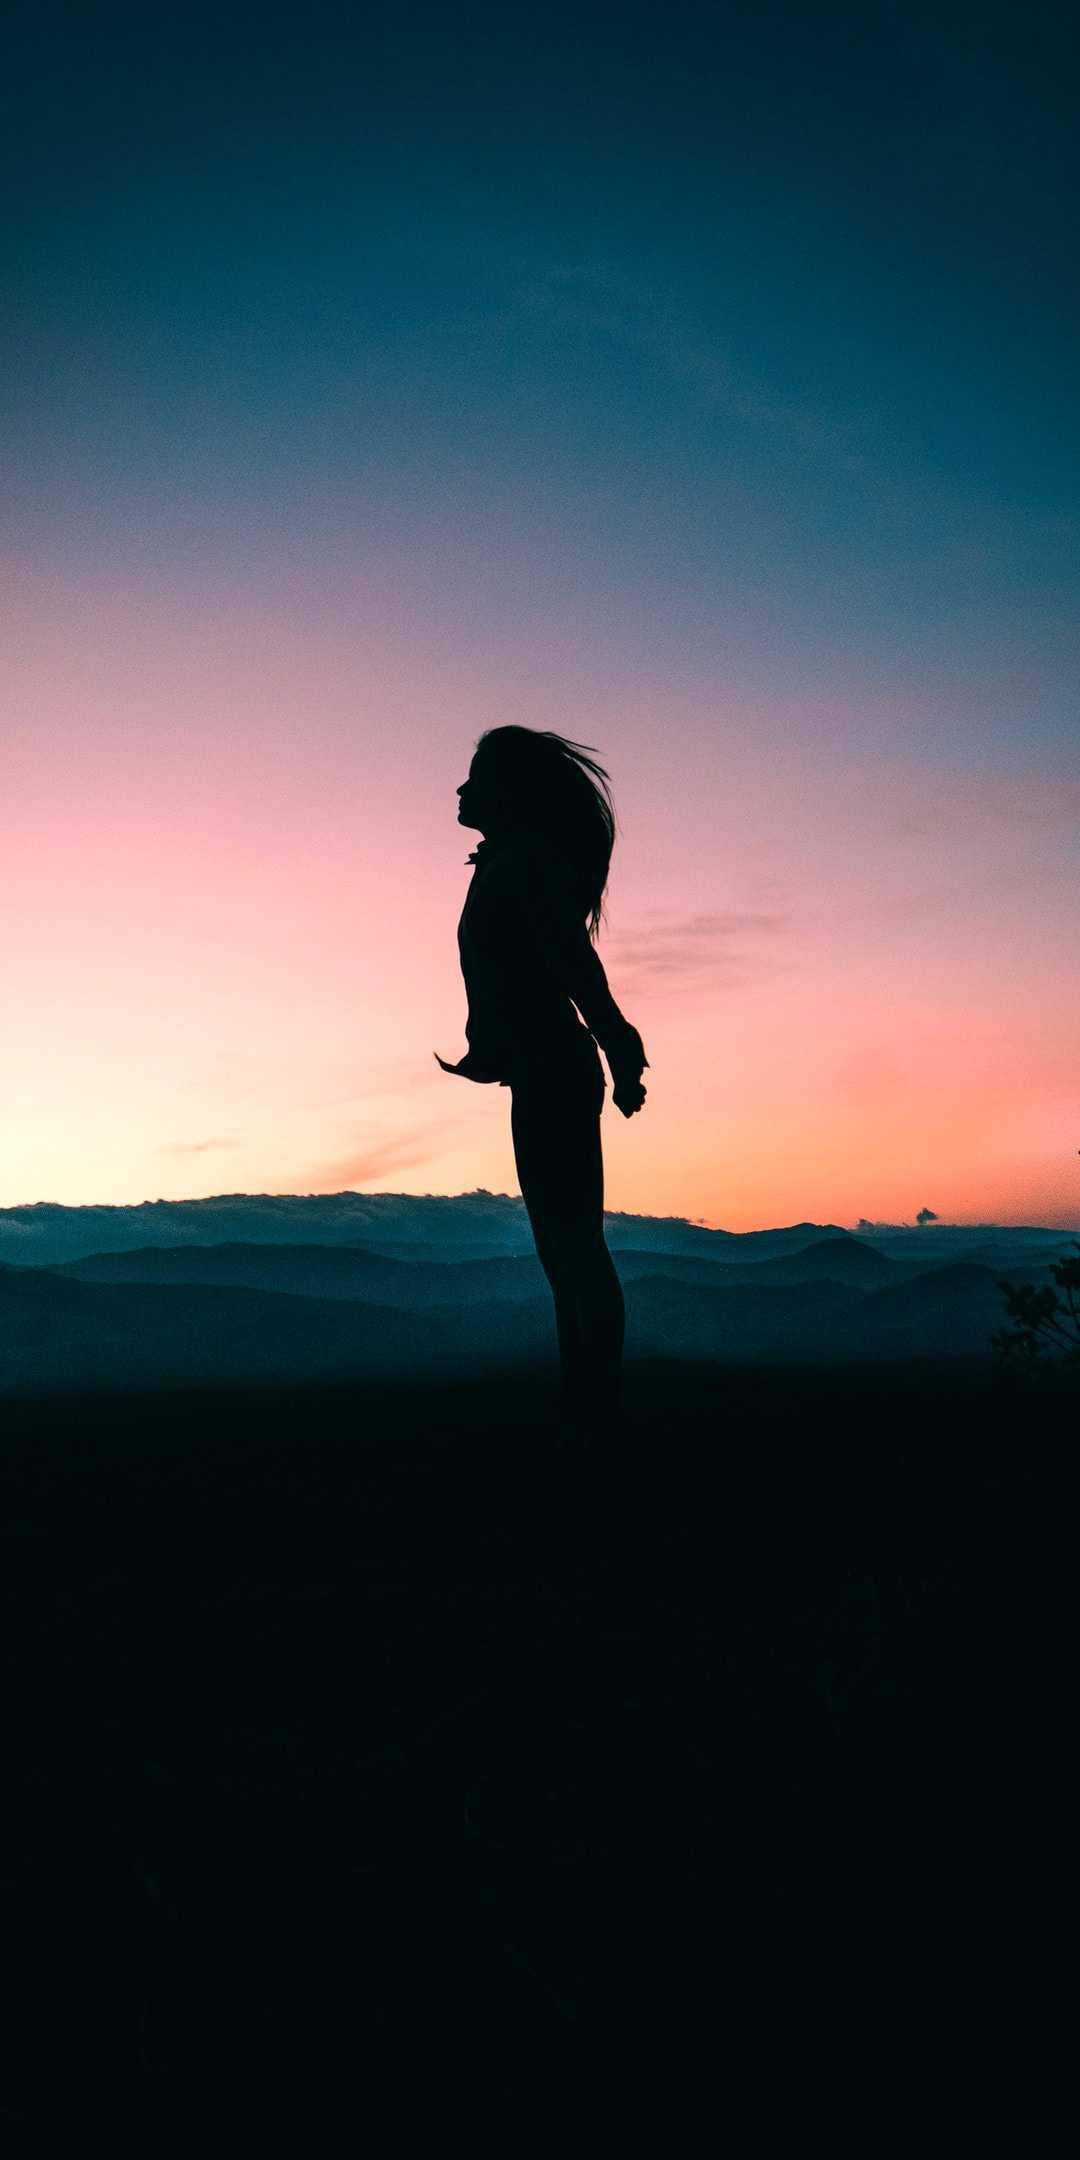 Sunset Shadow Girl iPhone Wallpaper